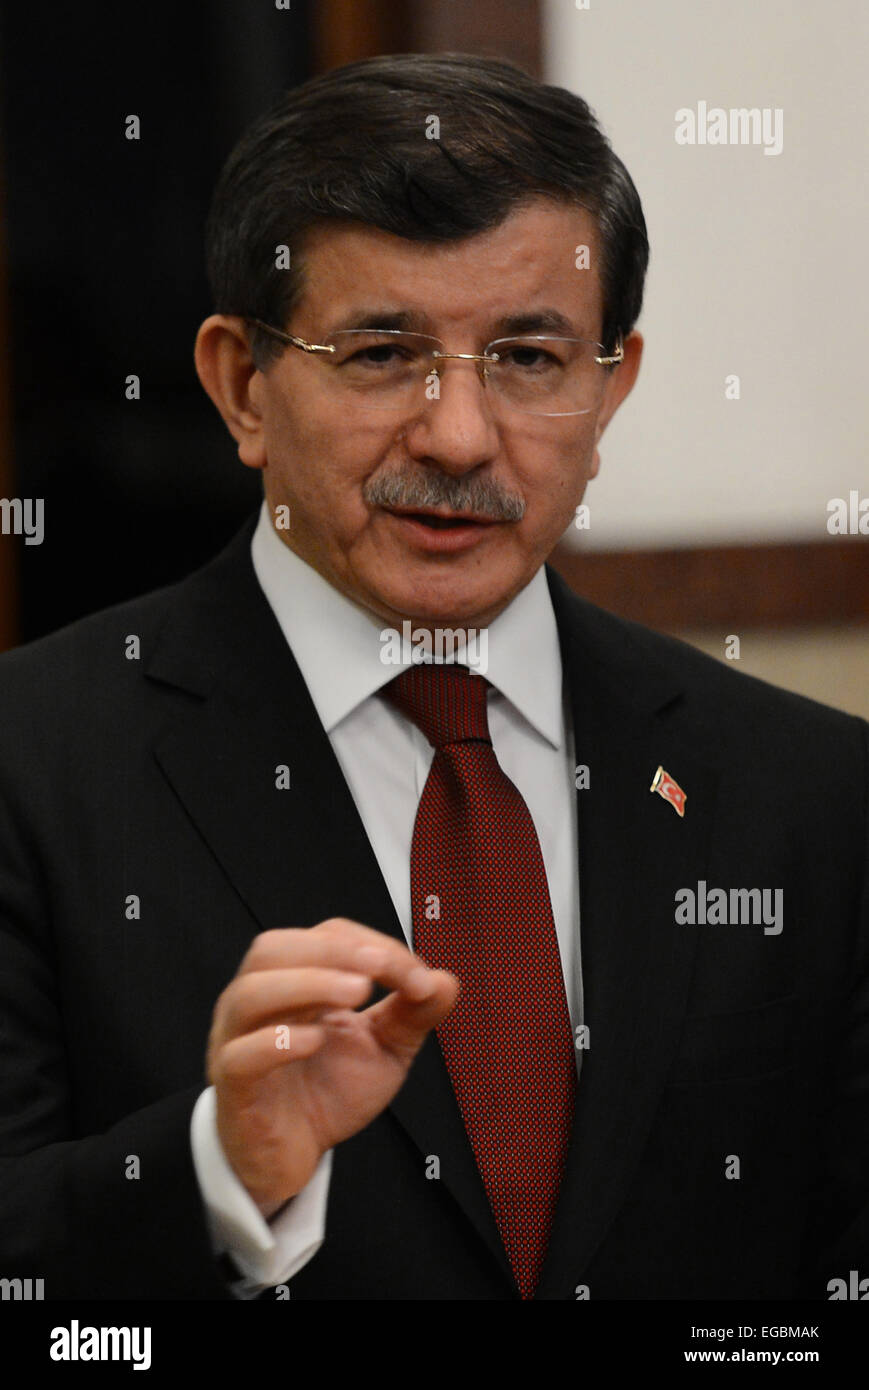 (150222) -- ANKARA, Feb. 22, 2015 (Xinhua) -- Turkish Prime Minister Ahmet Davutoglu speaks about the military evacuation - Stock Image